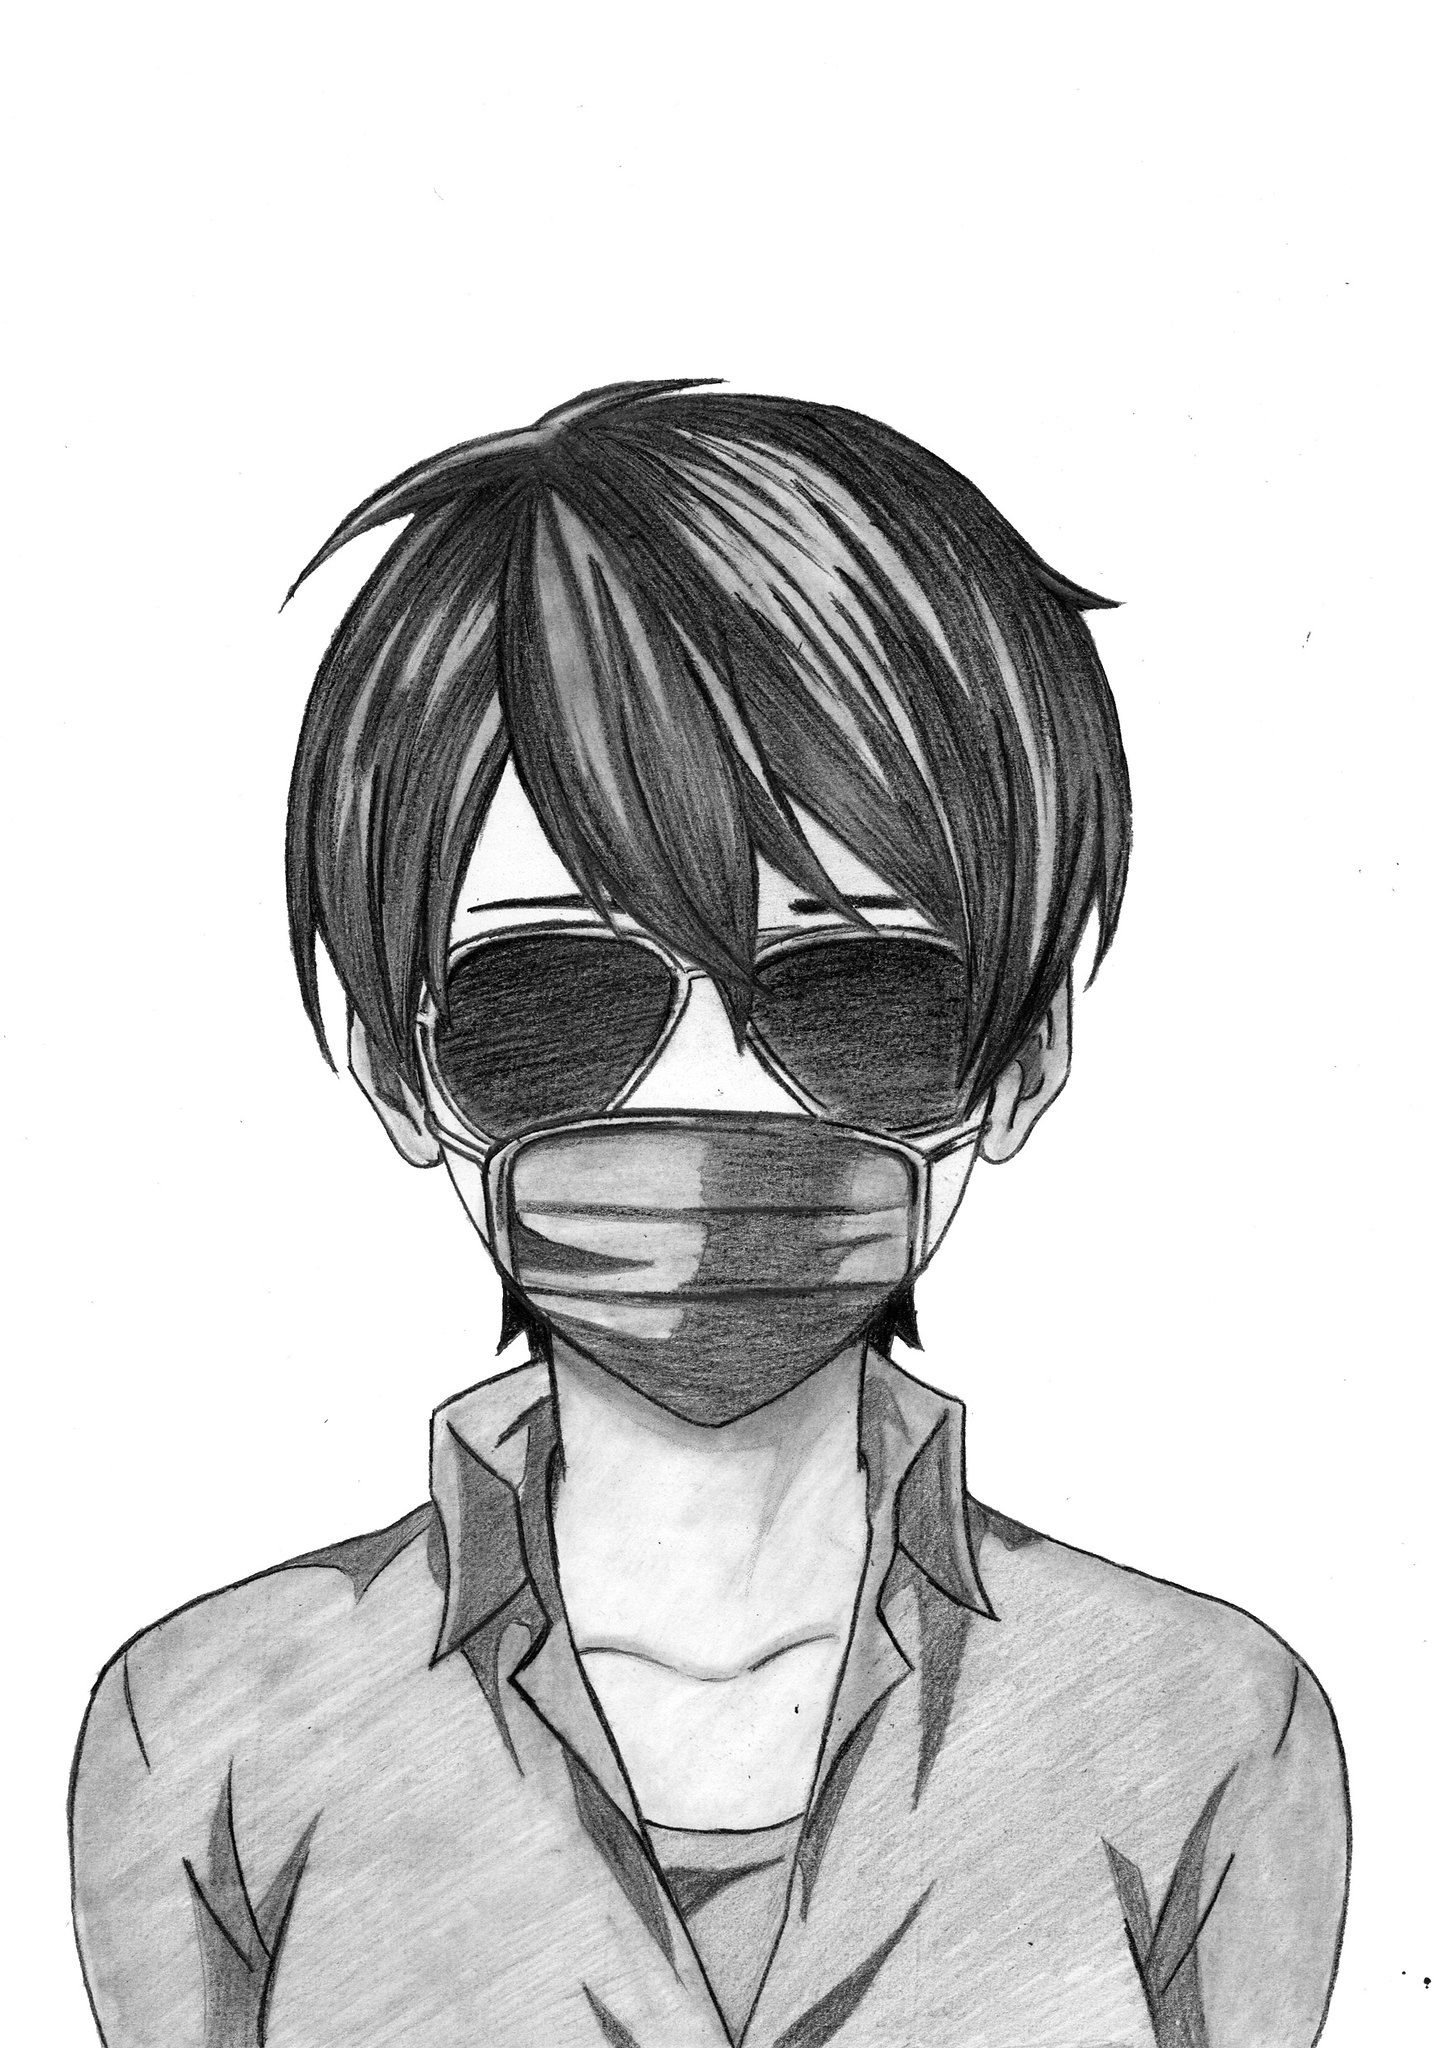 Draw Anime Boy With Mask Realistic Anime Drawing Anime Drawings Anime Drawings Boy Anime Drawings Tutorials